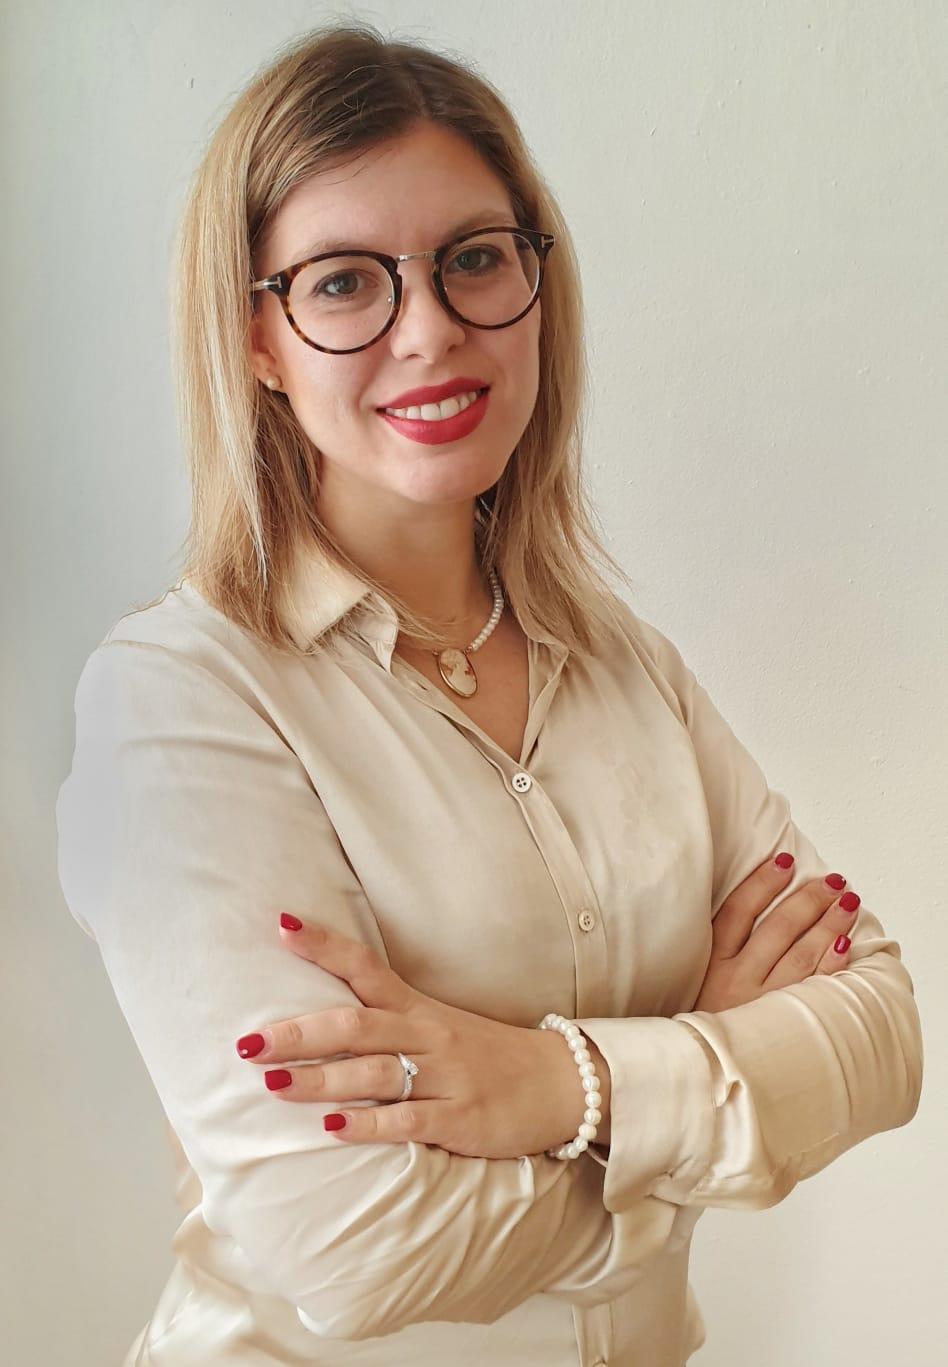 Irene Cantarelli biologa nutrizionista